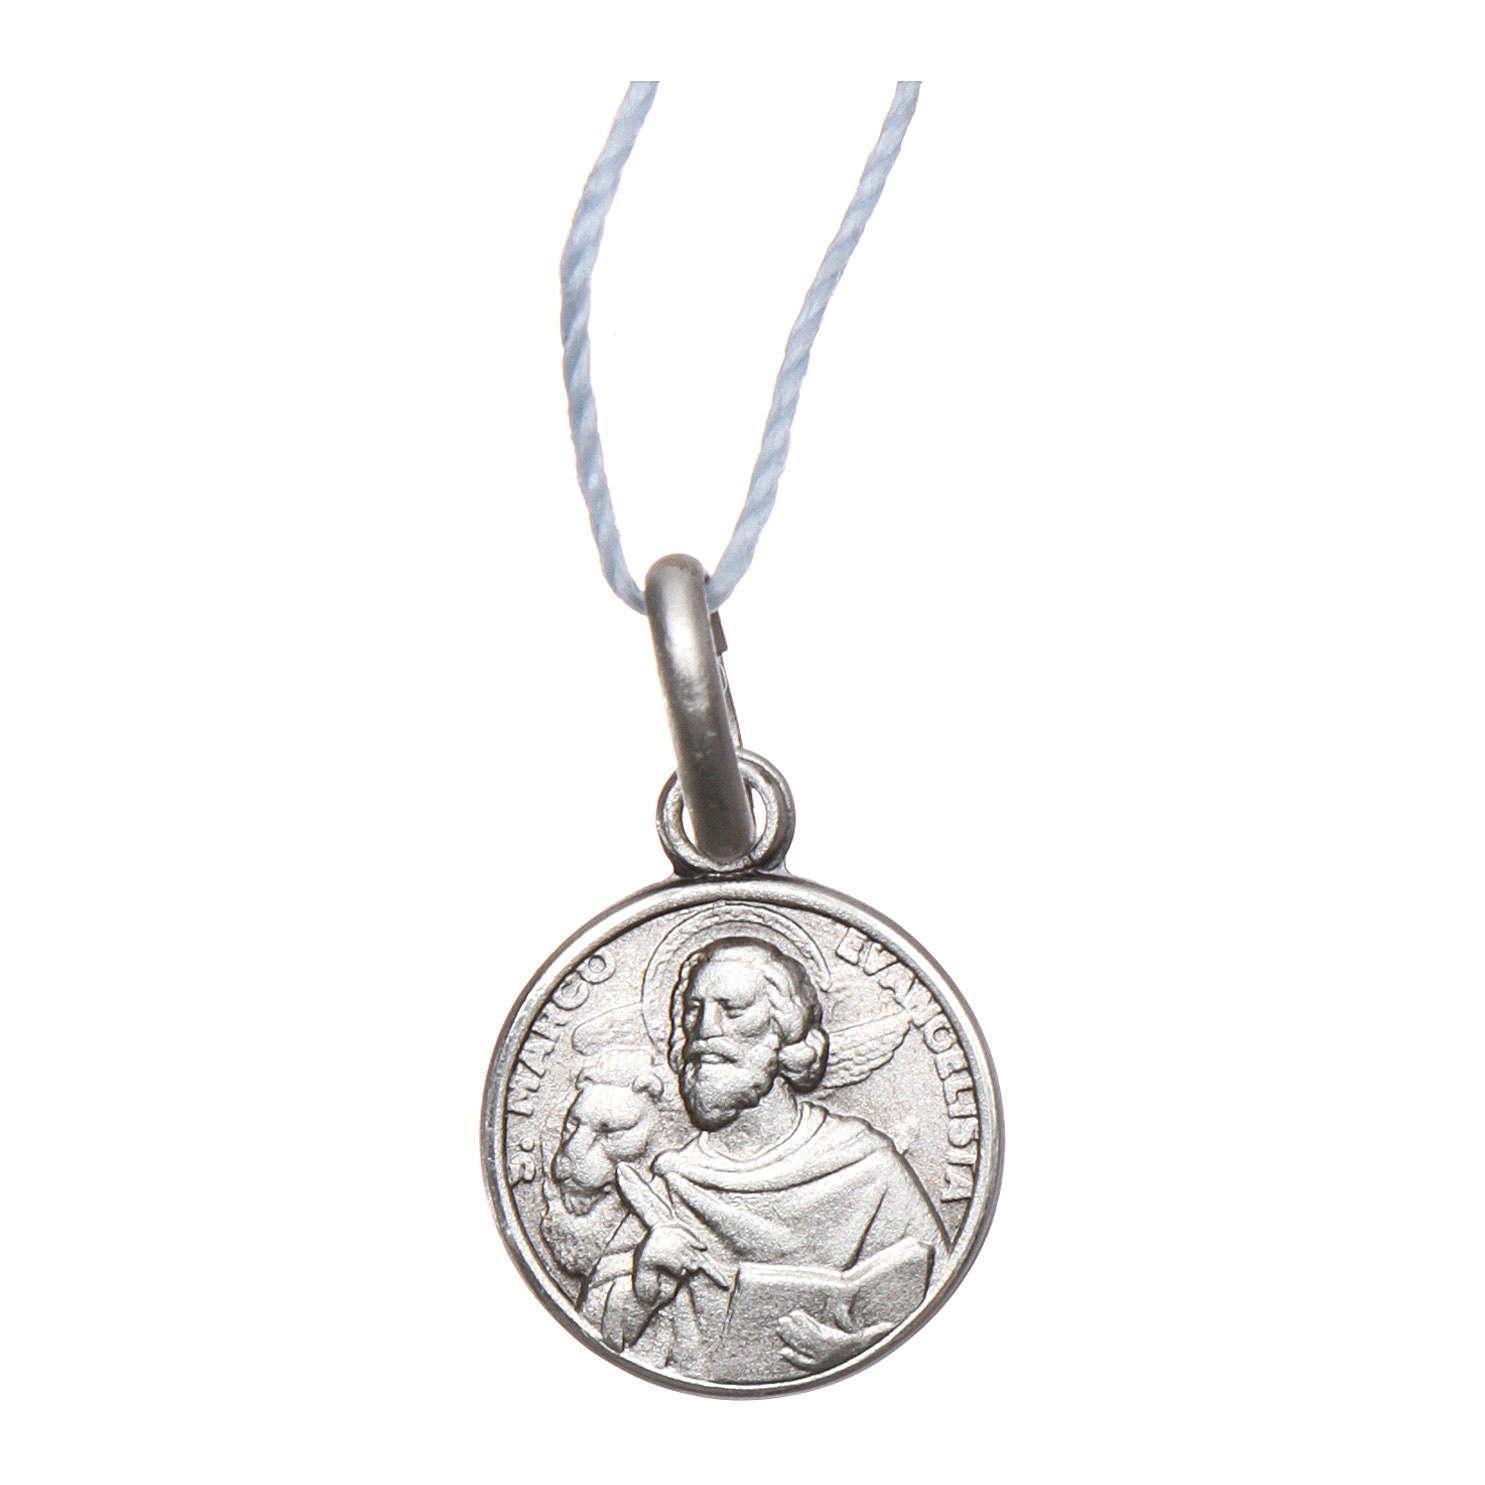 Medalla San Marco Evangelista Plata 925 rodiada 10 mm 4